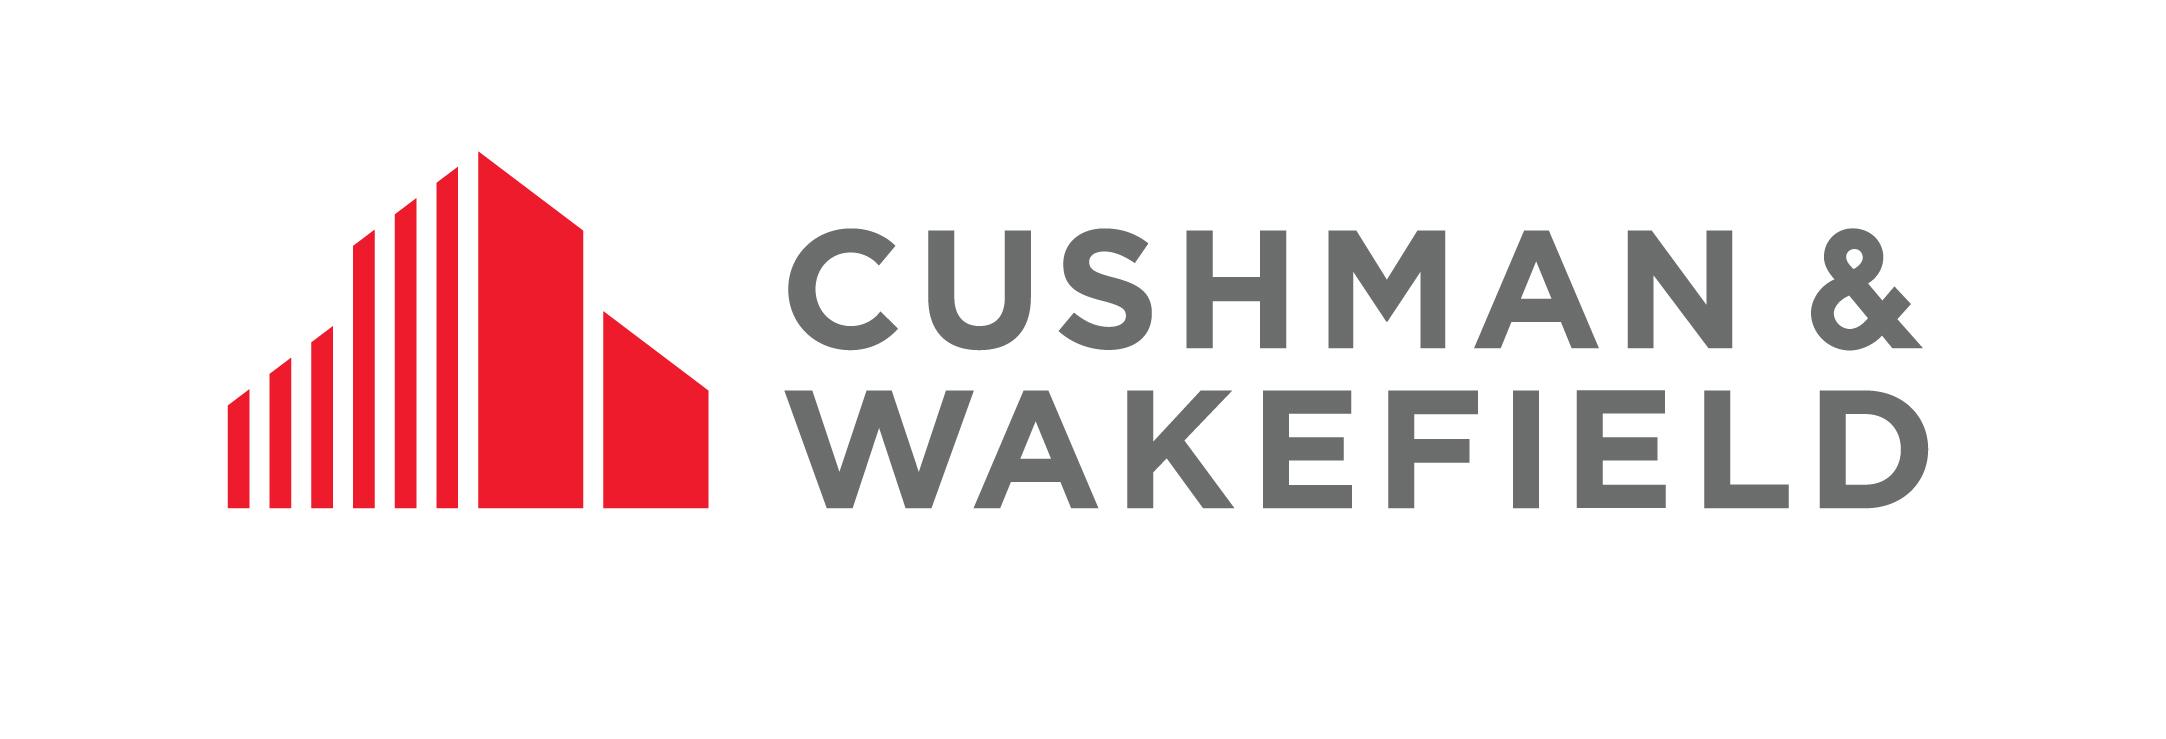 Cushman%20Wakefield.jpg